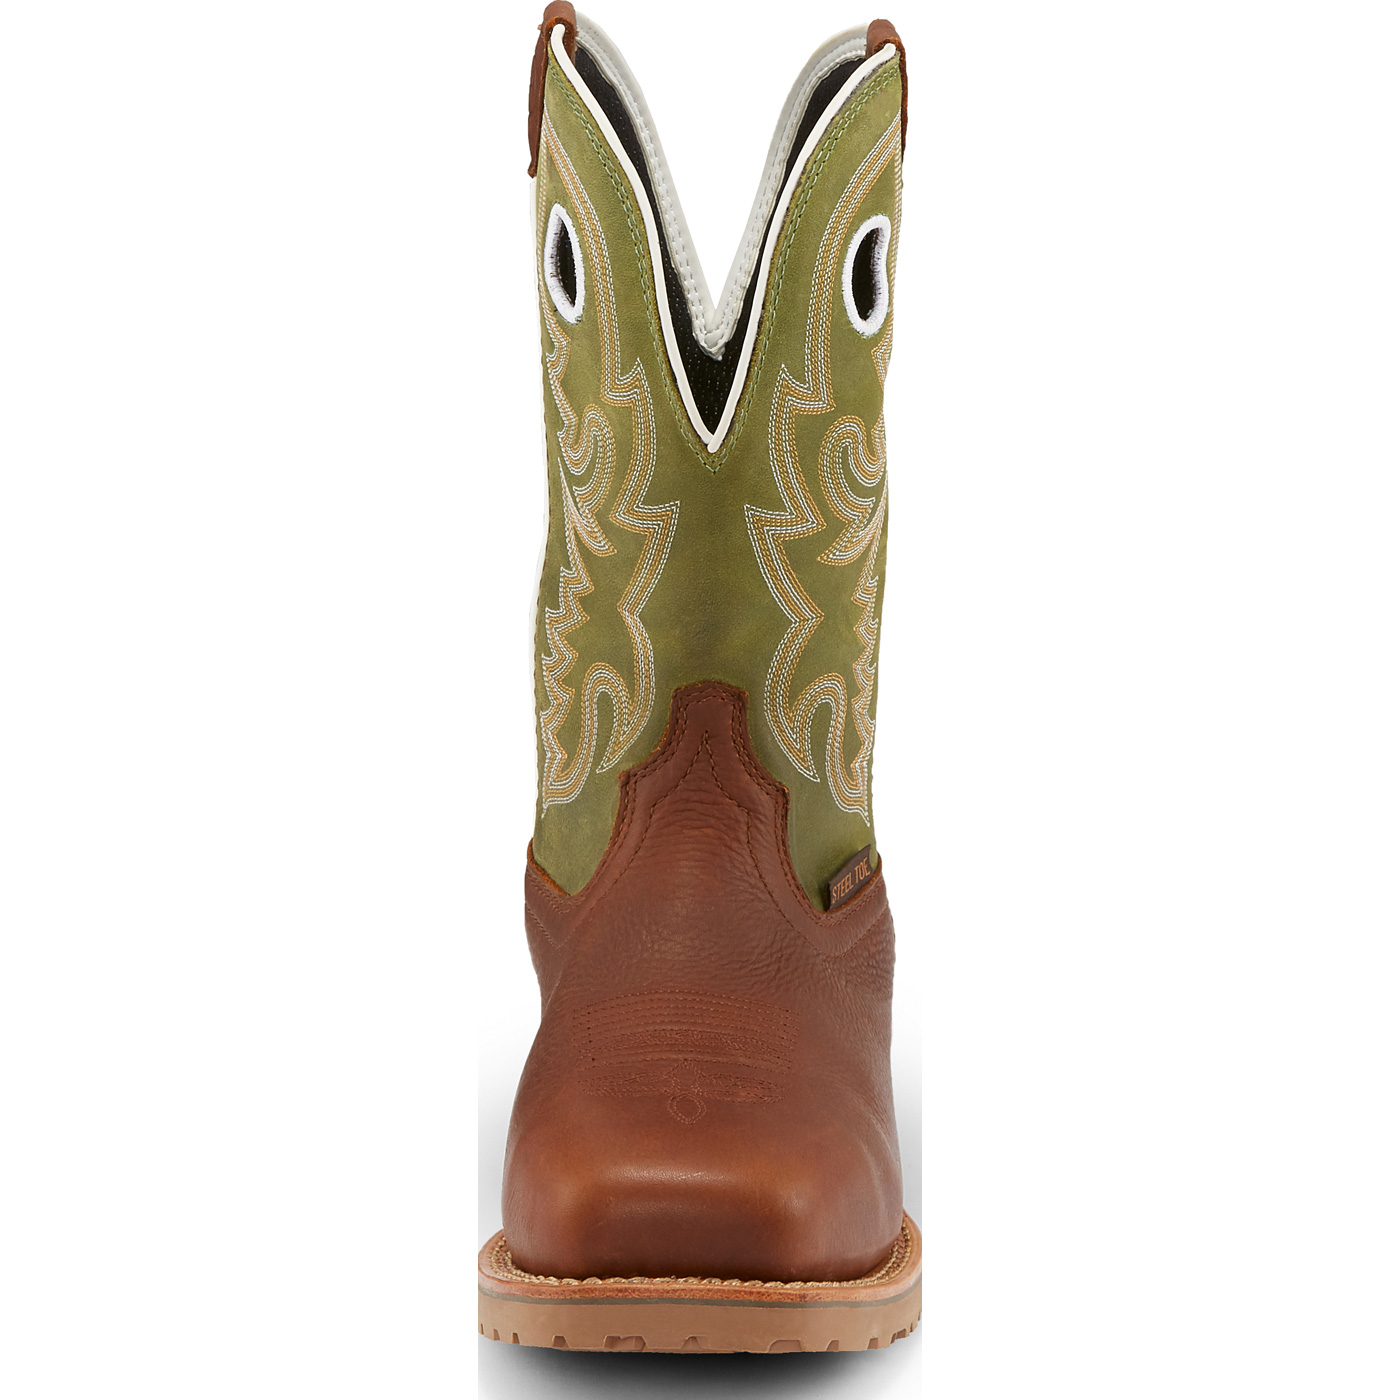 f1b26639ea7a Loading zoom. Justin Work Marshal Men s 11 inch Steel Toe Electrical Hazard  Waterproof ...